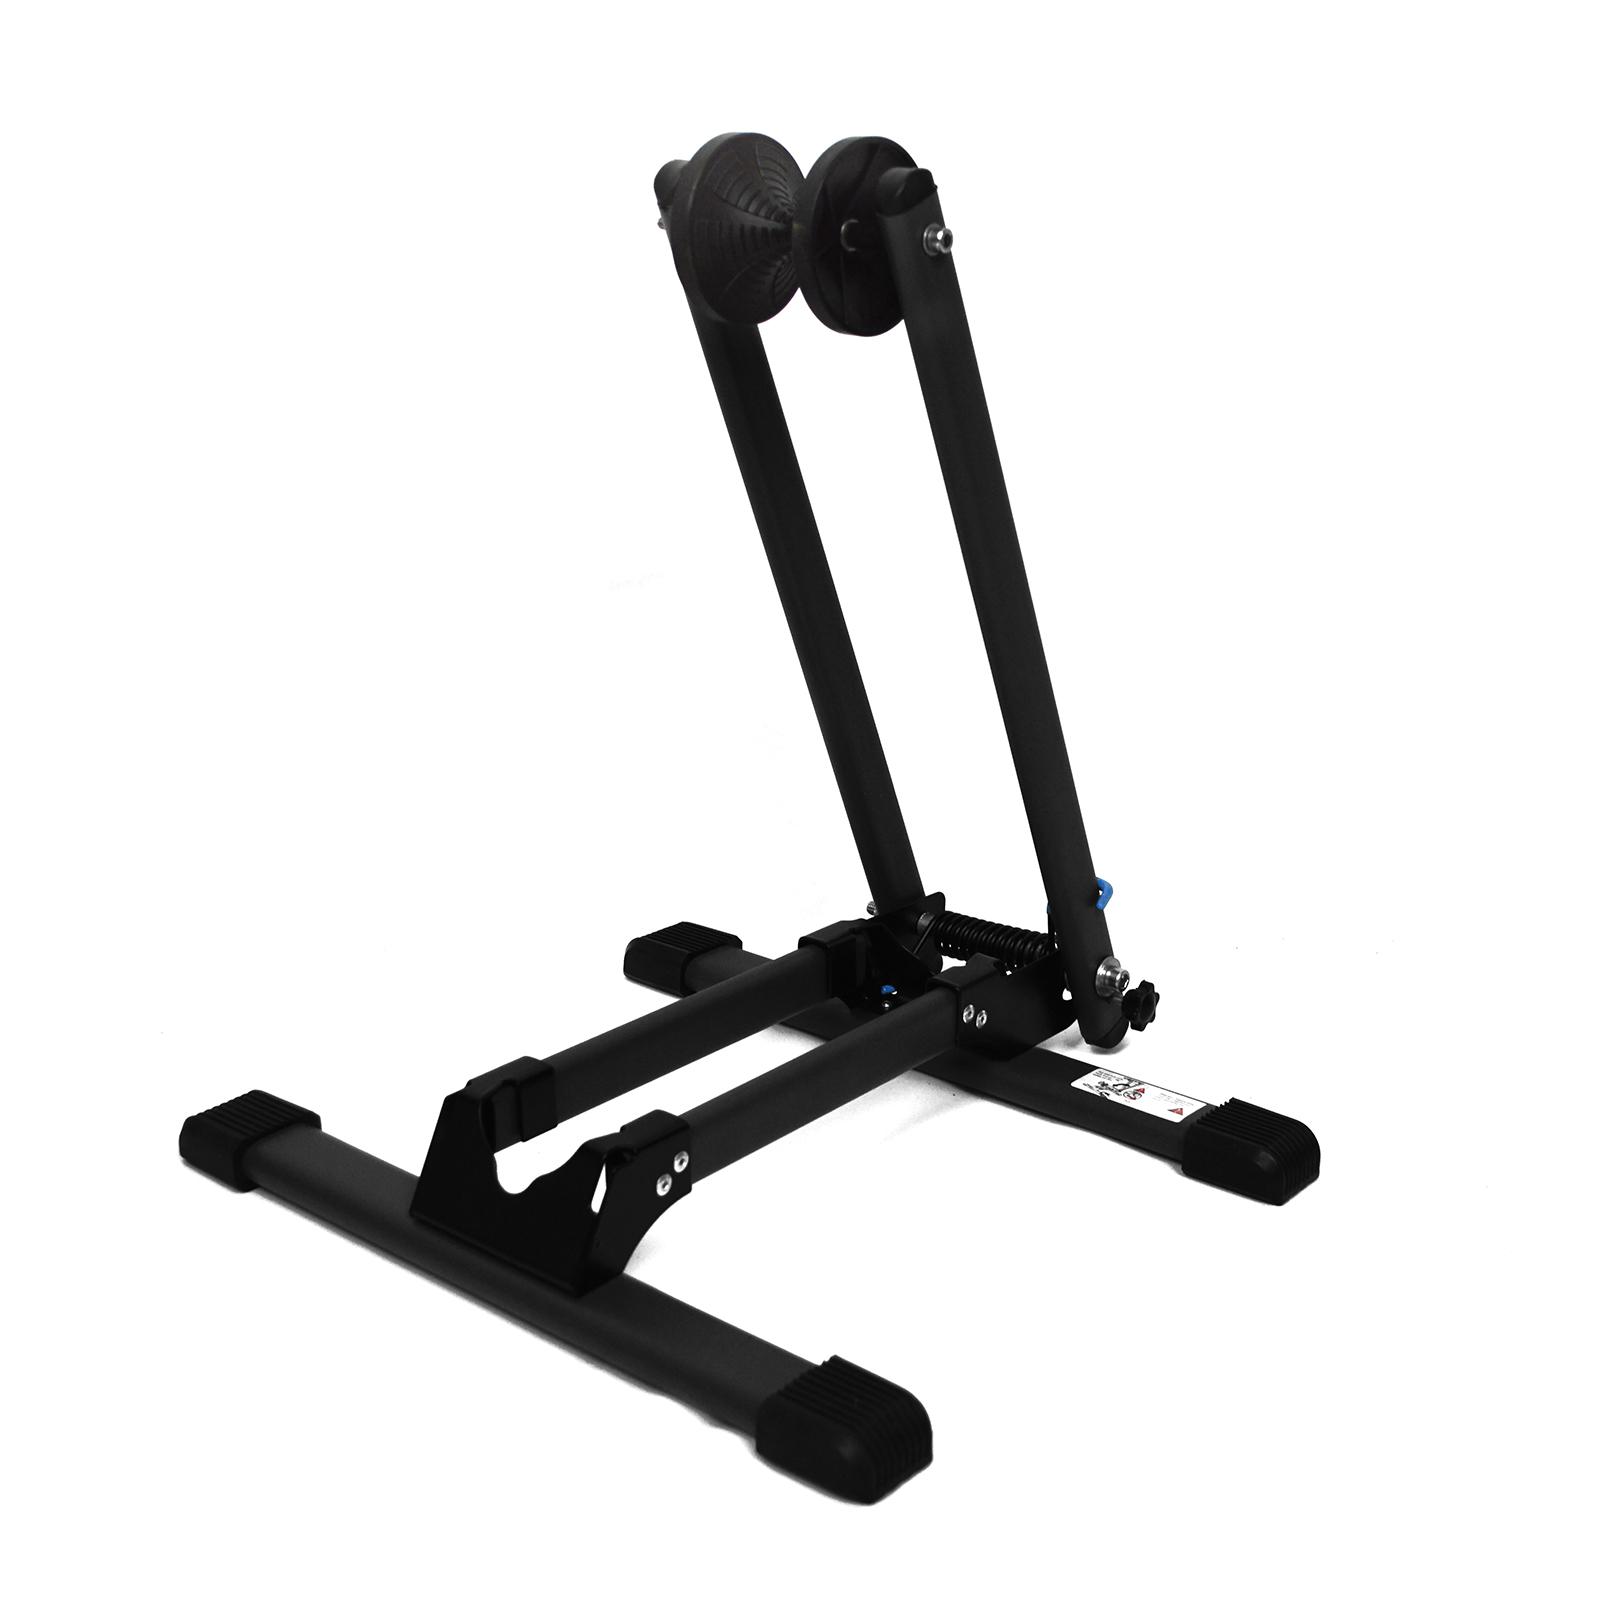 Handy Storage Adjustable Display Bike Stand